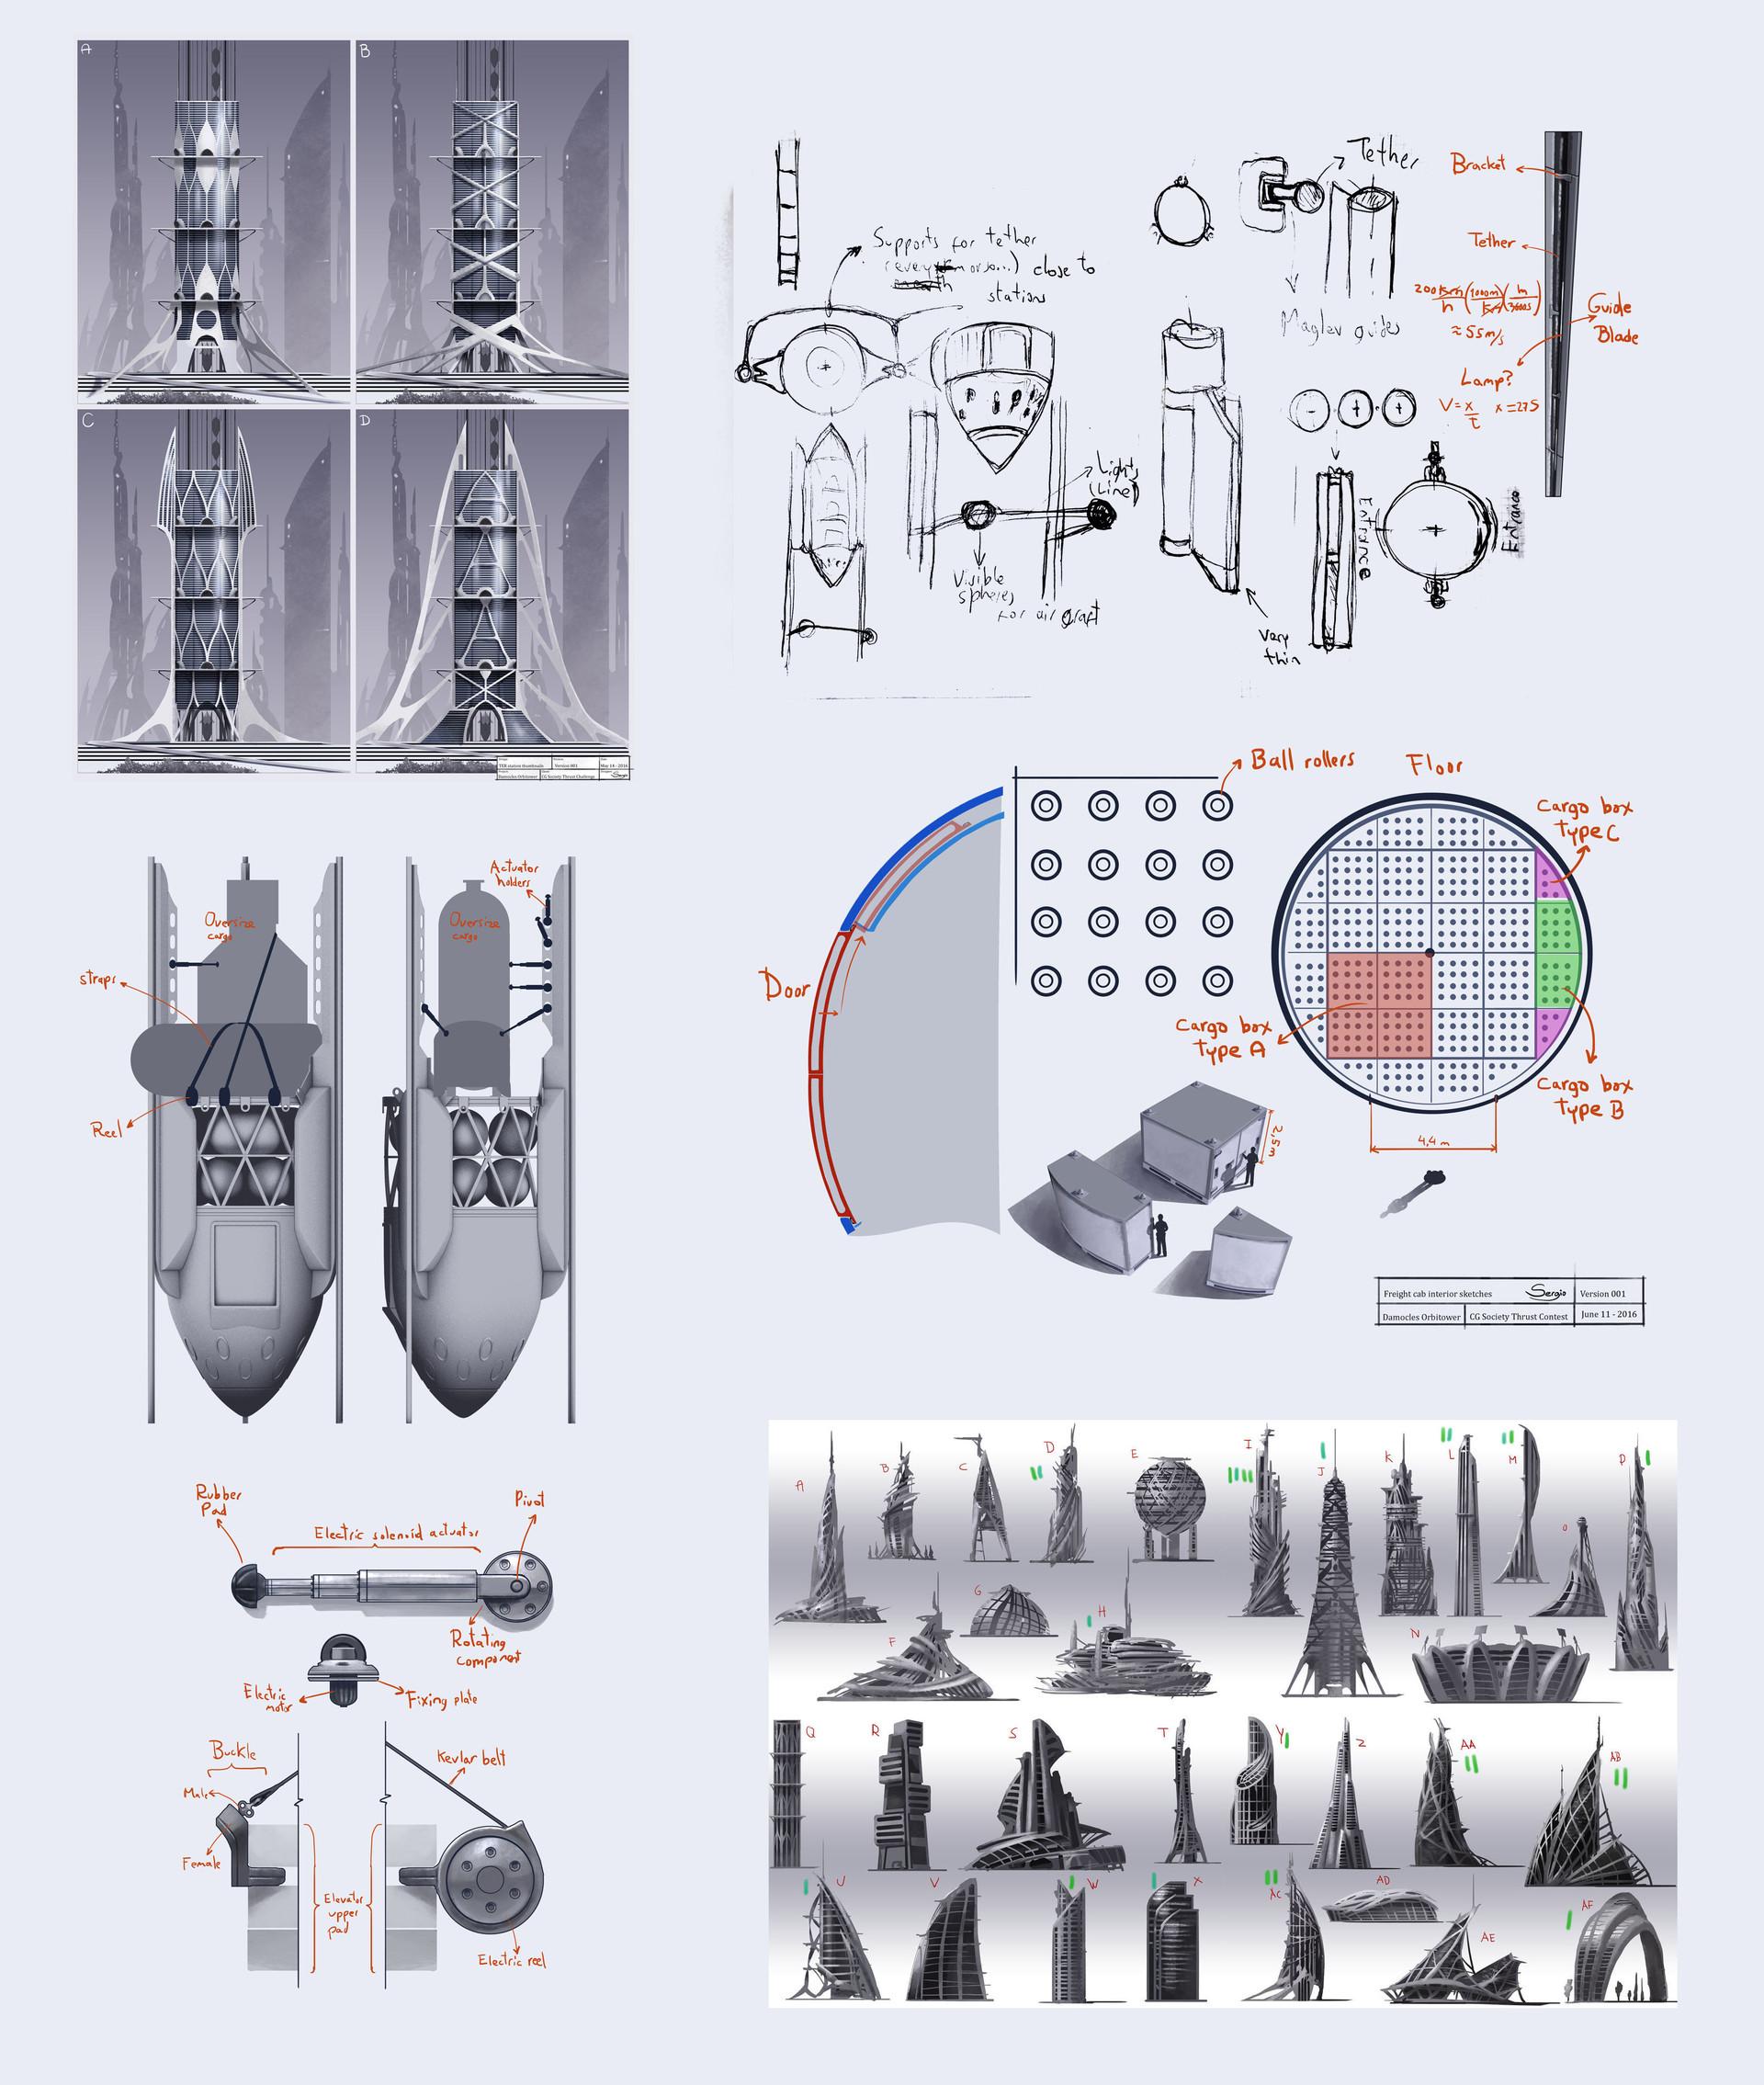 Sergio botero tflp damocles concept 3